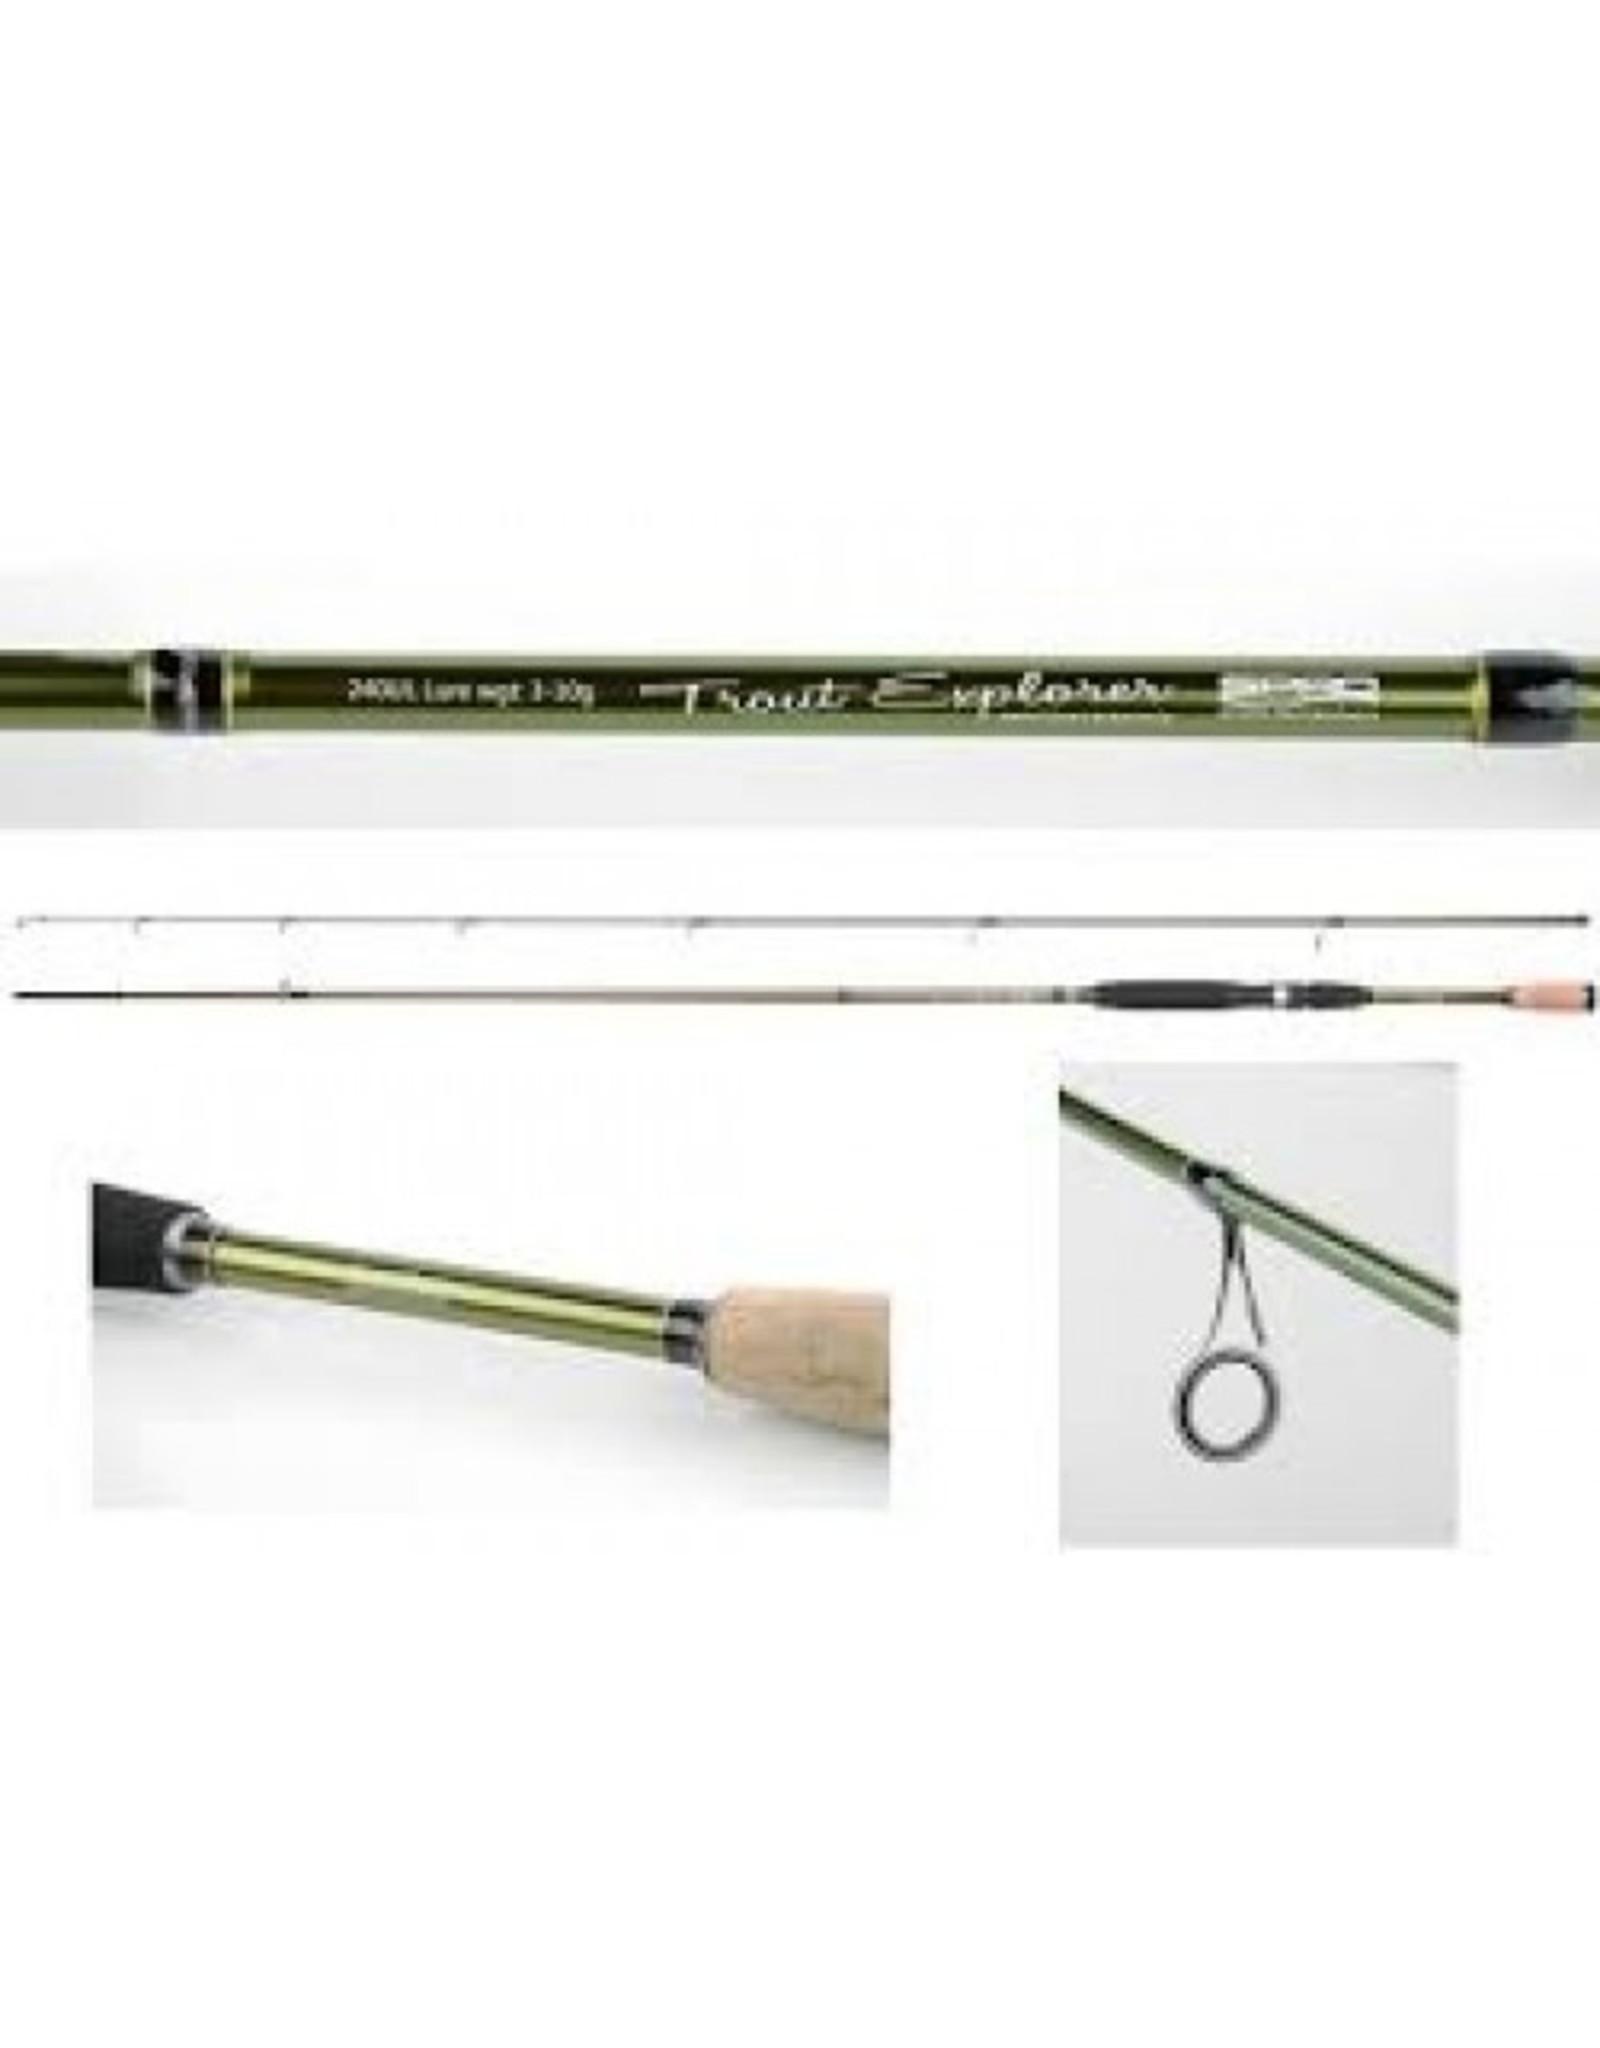 SPRO Spro Trout Explorer 2.10 m 3-10 g